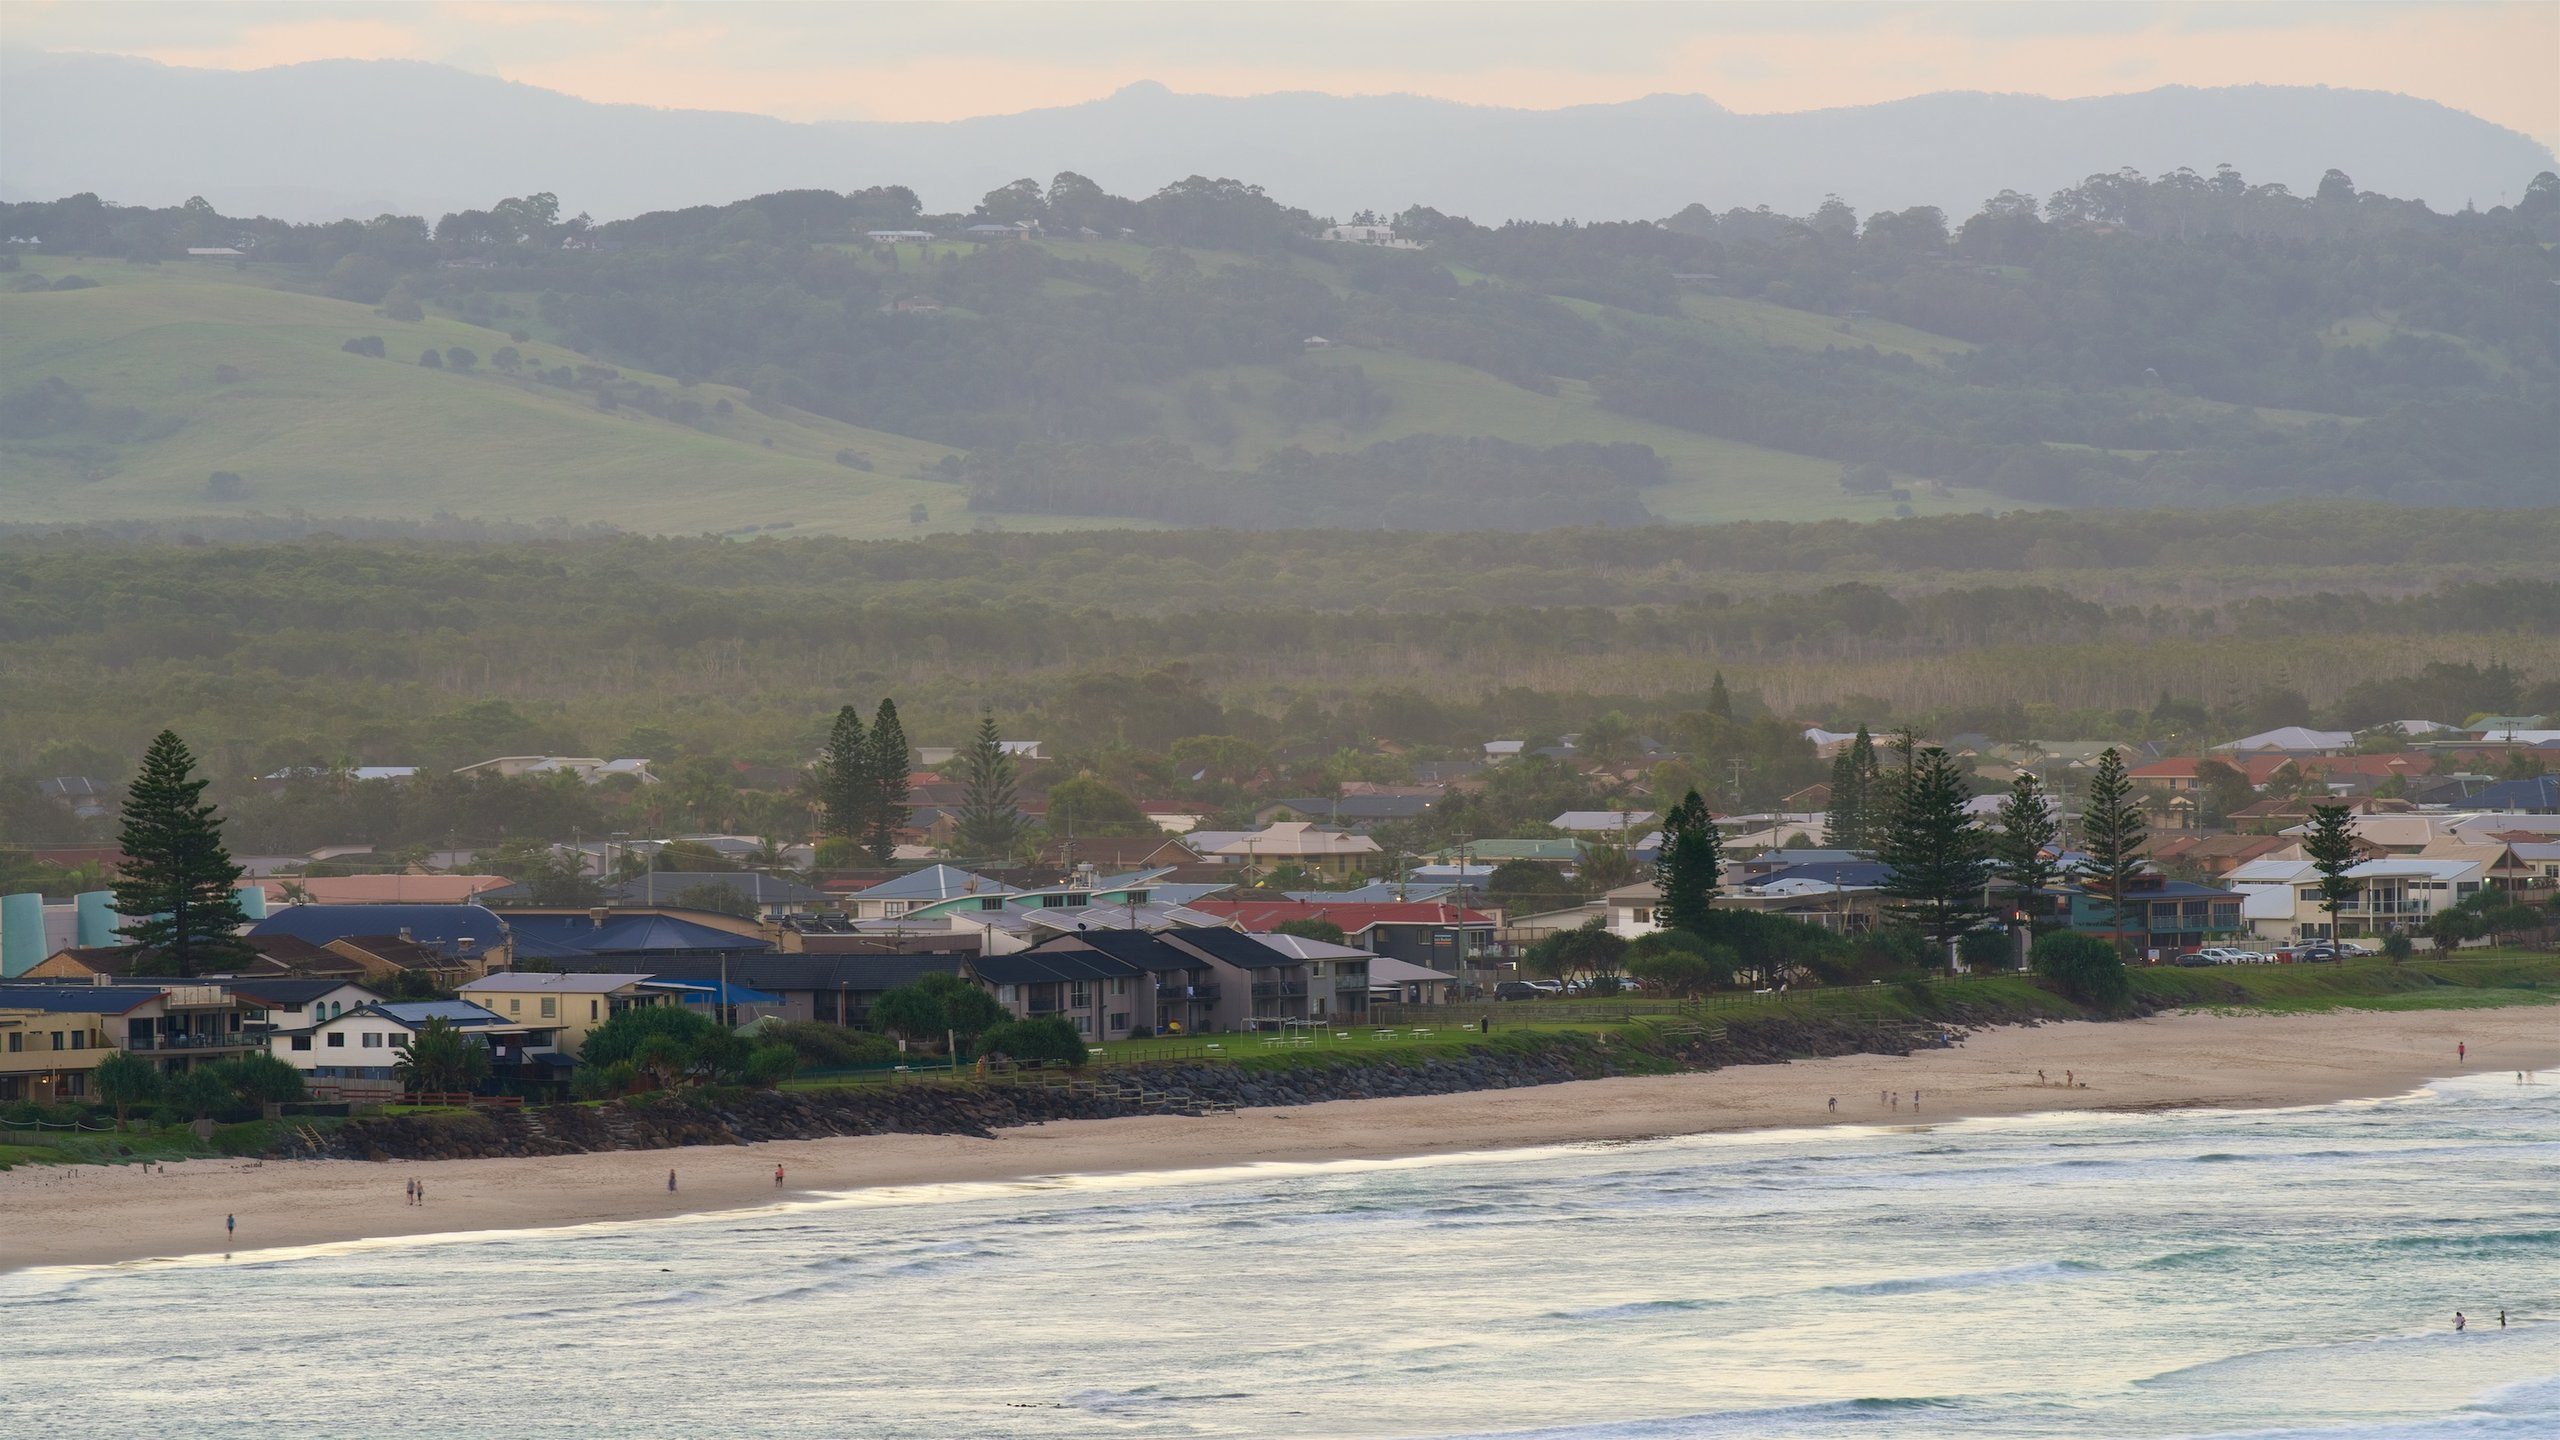 Lennox Head, Ballina, New South Wales, Australia